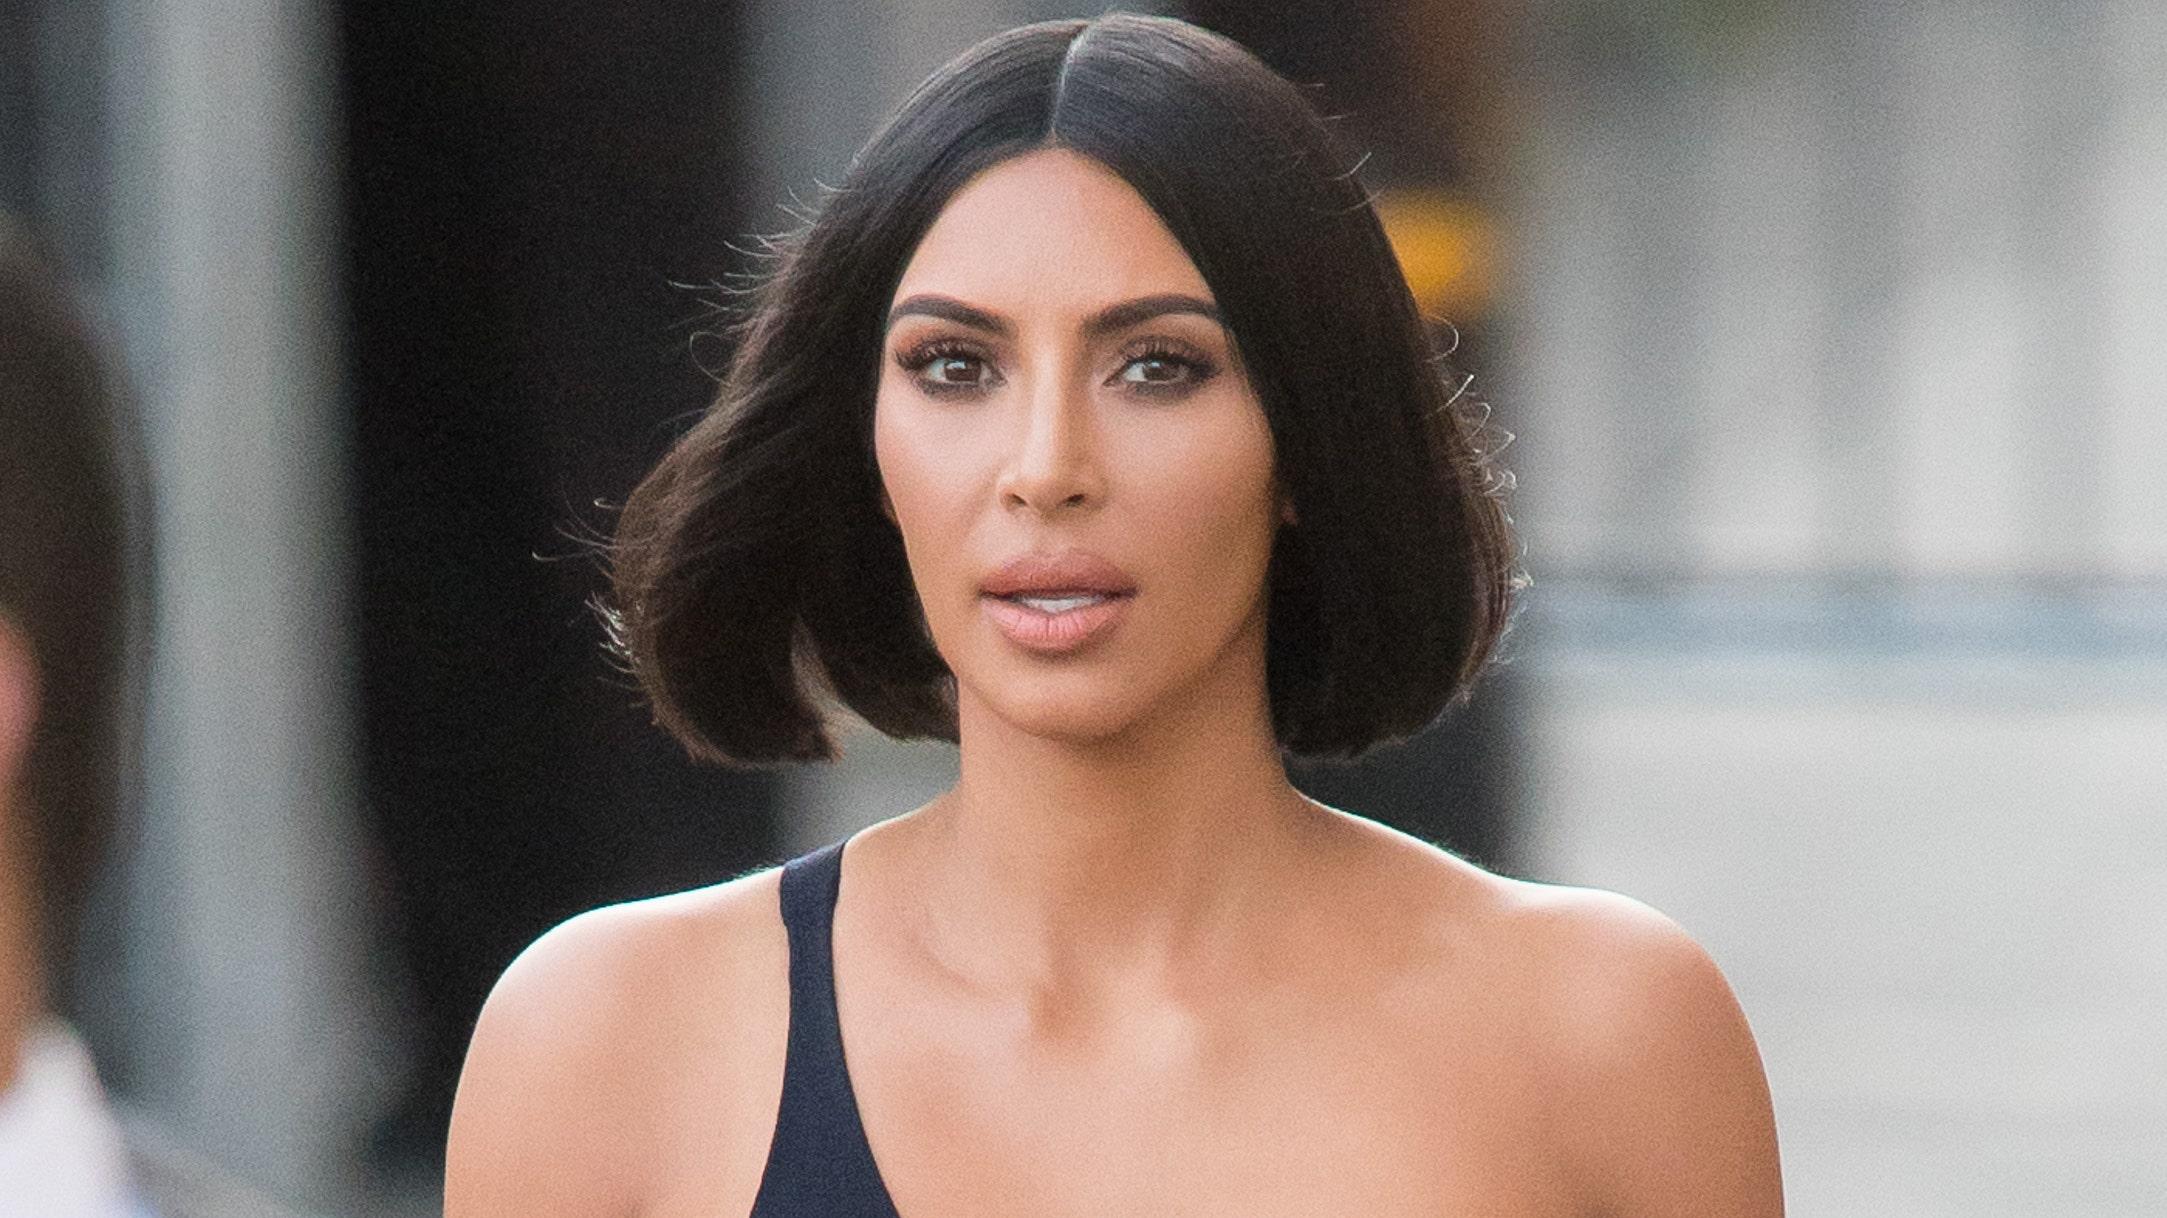 Westlake Legal Group Kim-Kardashian Kim Kardashian slammed for Photoshop fail on her foot The Sun fox-news/entertainment/kardashians fox-news/entertainment/events/scandal fox-news/entertainment fnc/entertainment fnc article 6de9186a-1a21-5802-a765-03ed9f2a6309